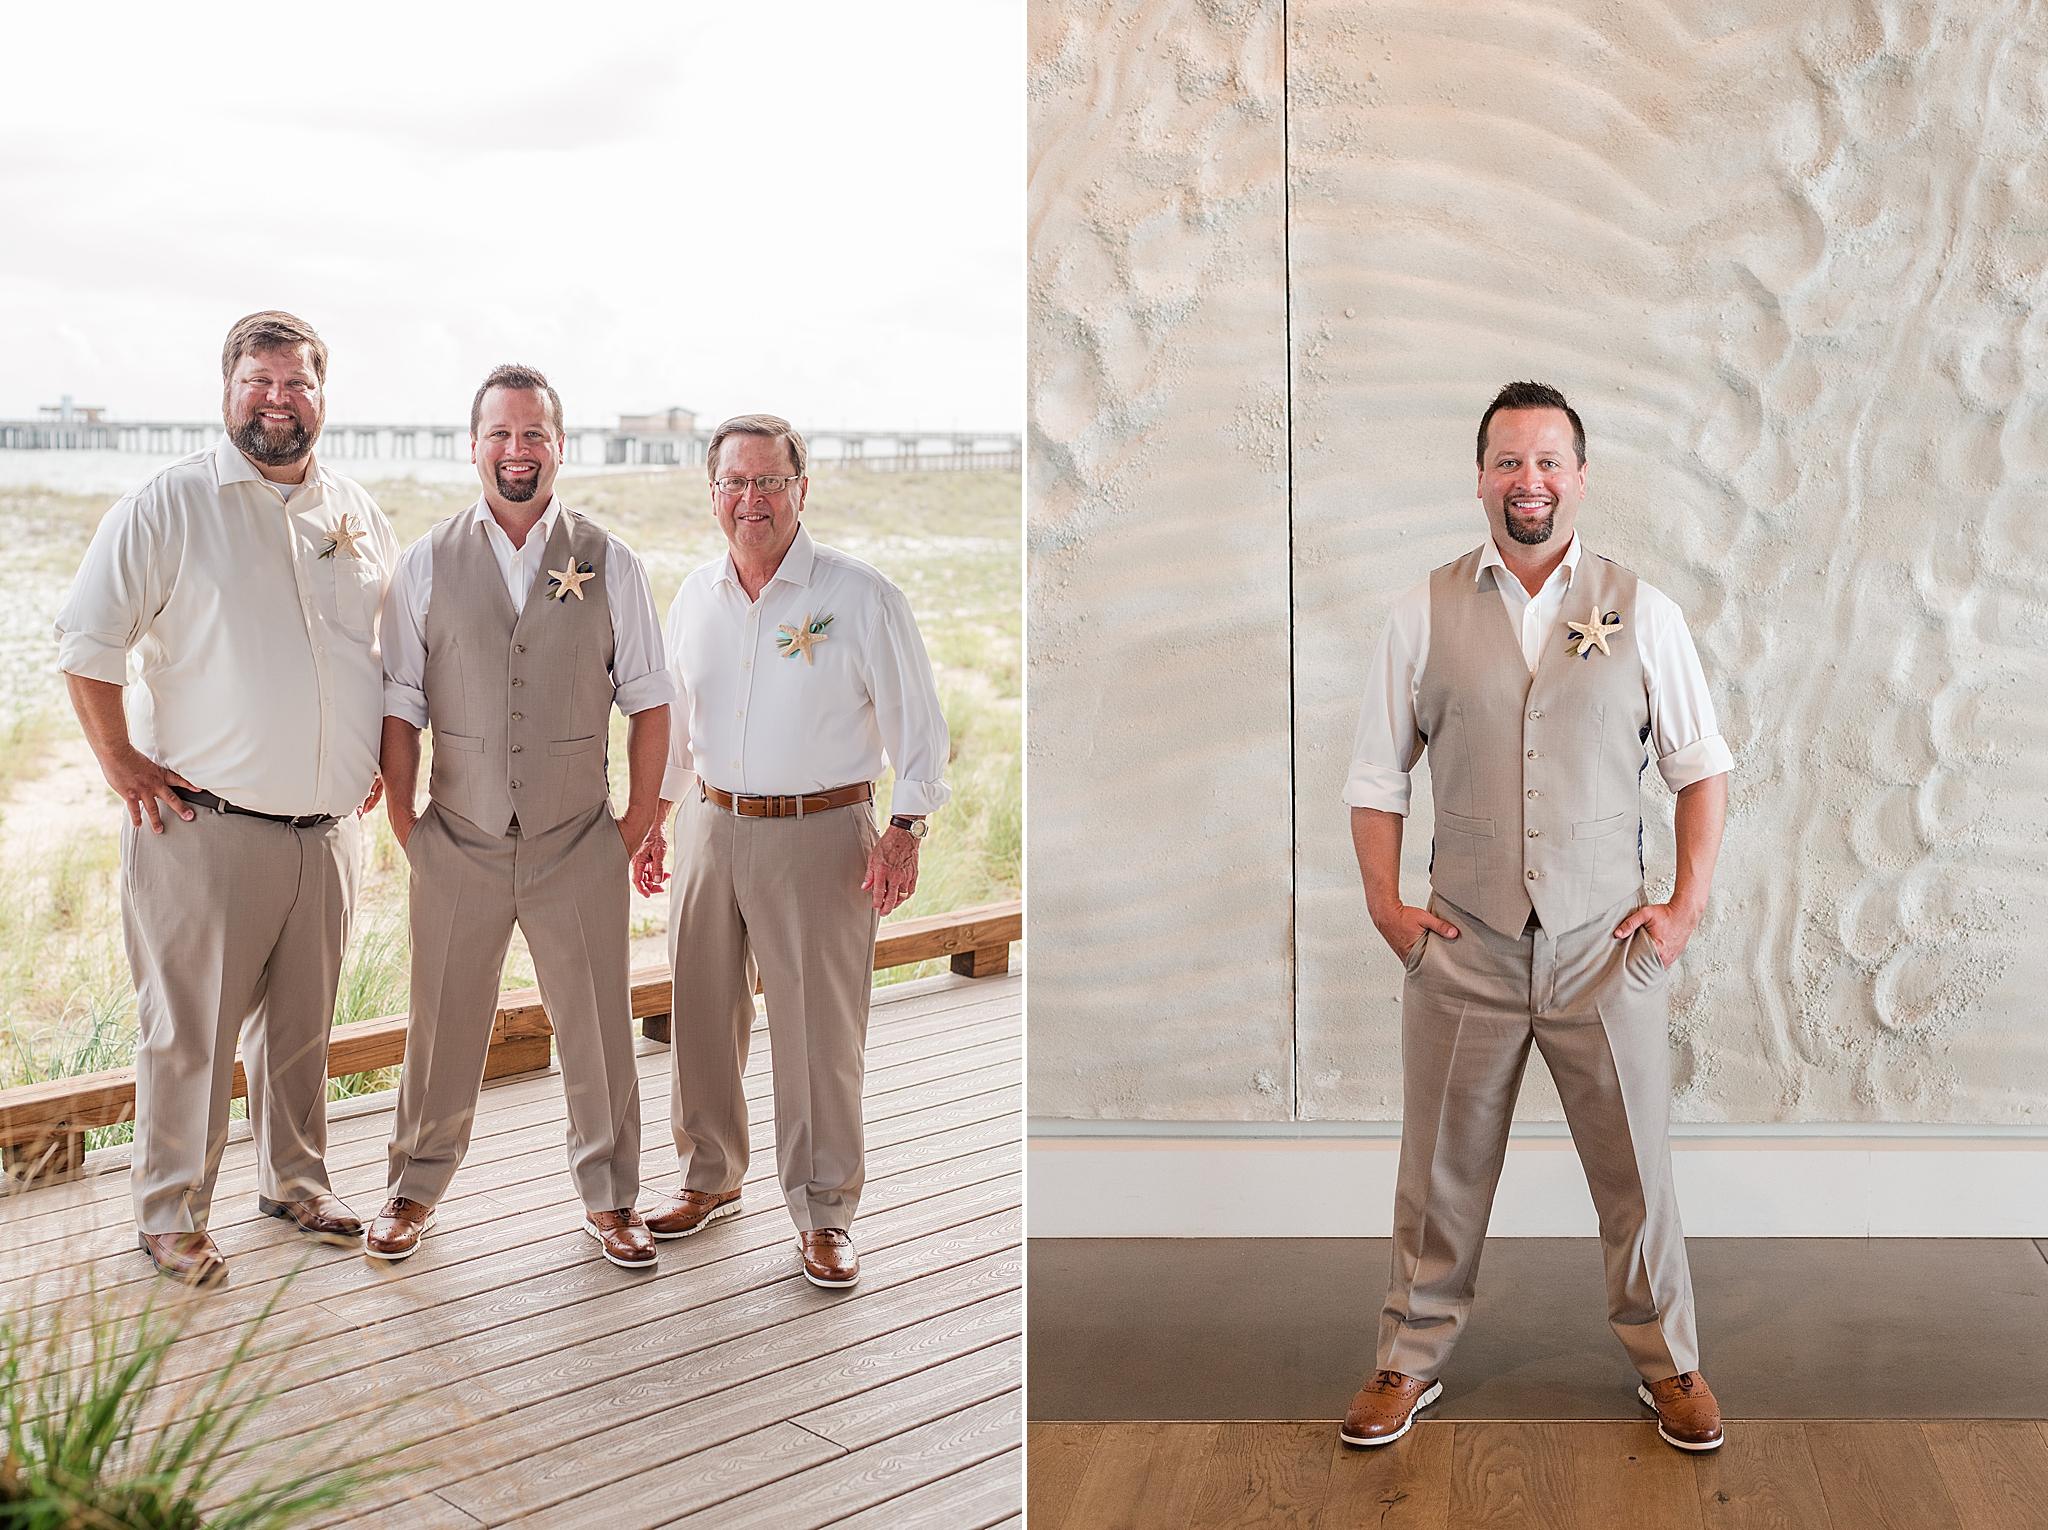 groom poses by hotel with groomsmen before beach wedding